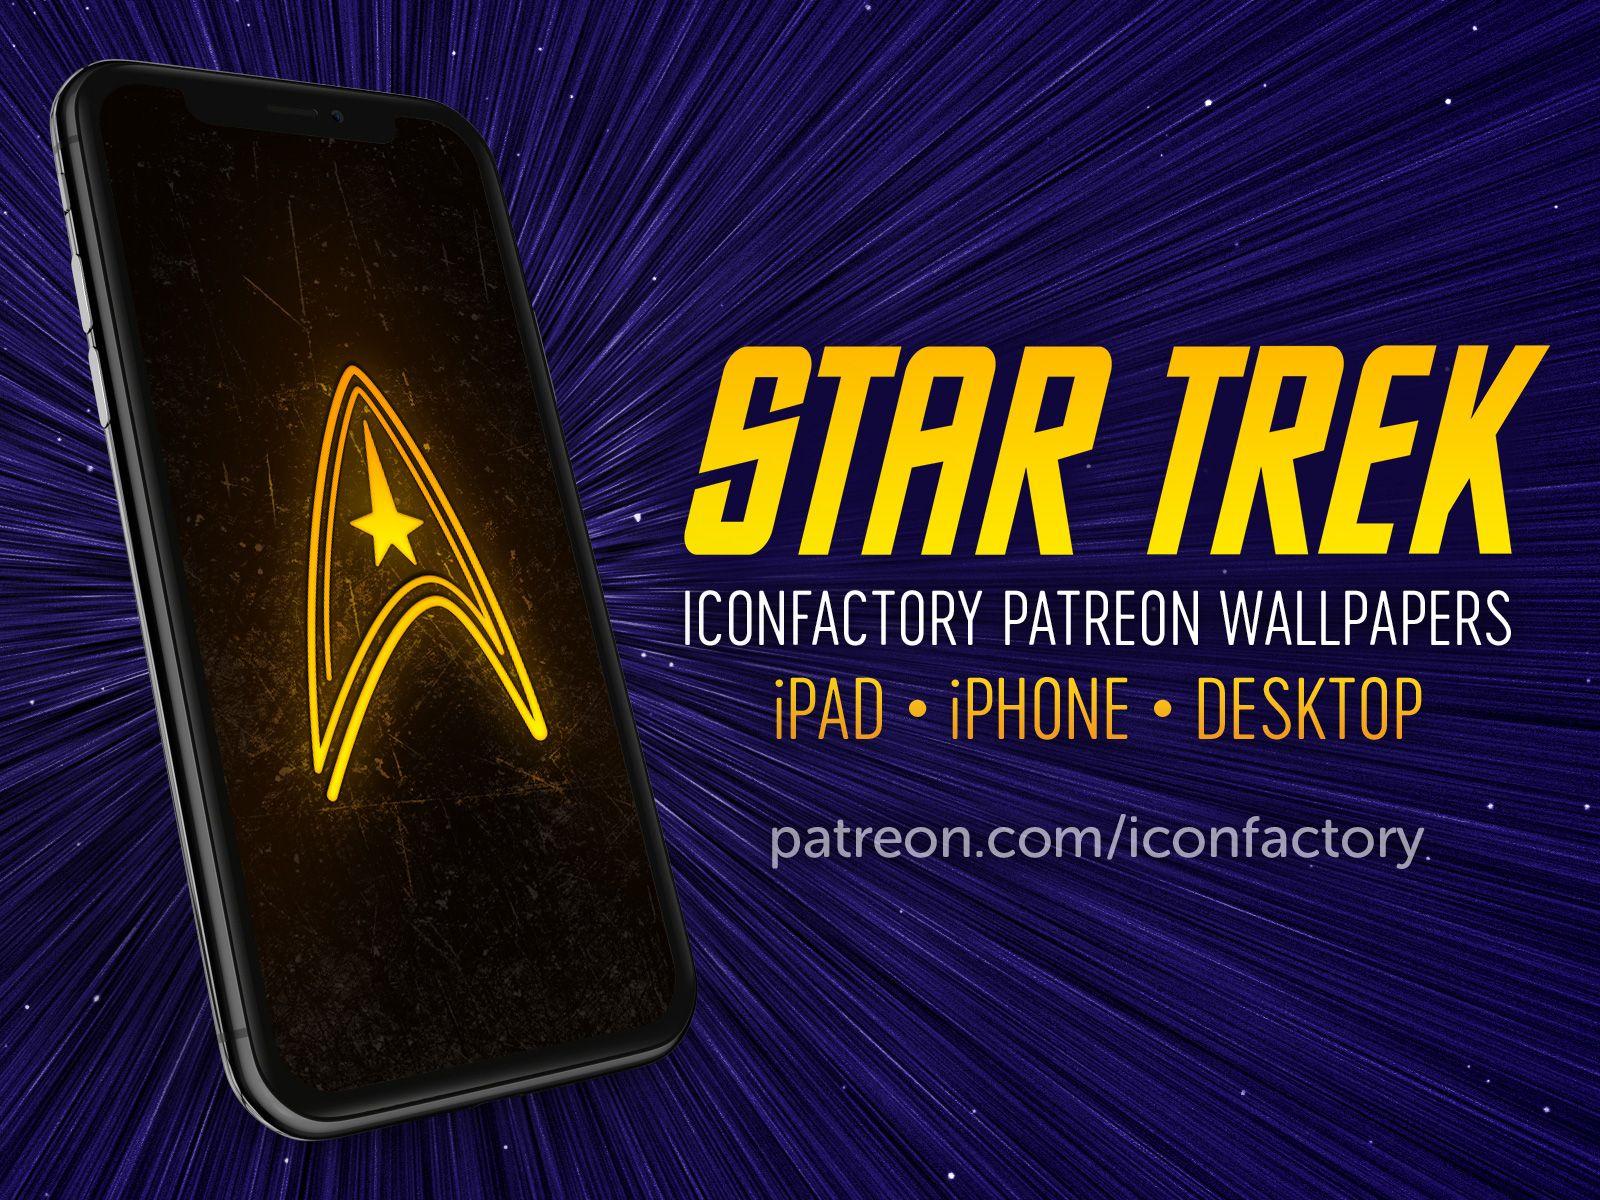 Star Trek Wallpaper | iPhone | Star trek wallpaper、Star Trek 和 Trek